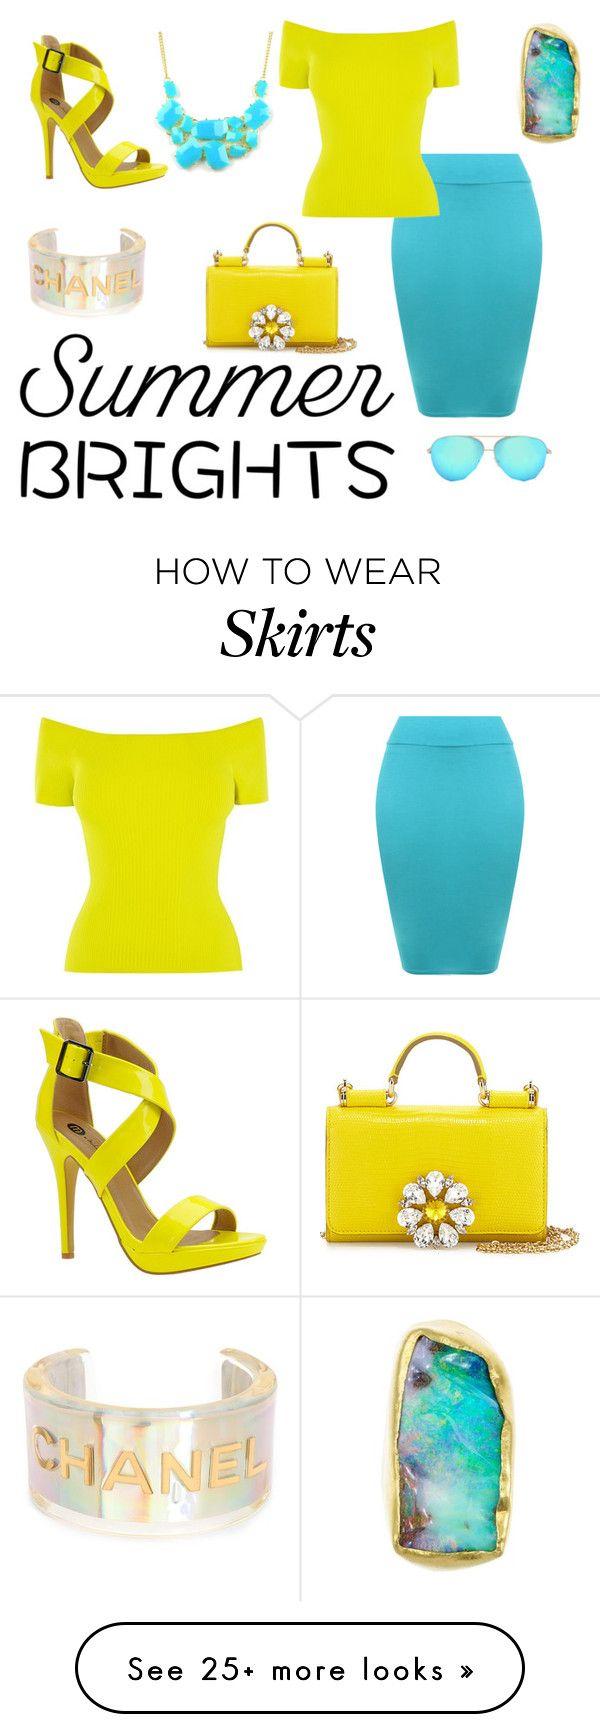 """Bright skirt"" by aundreathecuban on Polyvore featuring WearAll, Chanel, Karen Millen, Dolce&Gabbana, Michael Antonio, Victoria Beckham, Emi Jewellery and summerbrights"